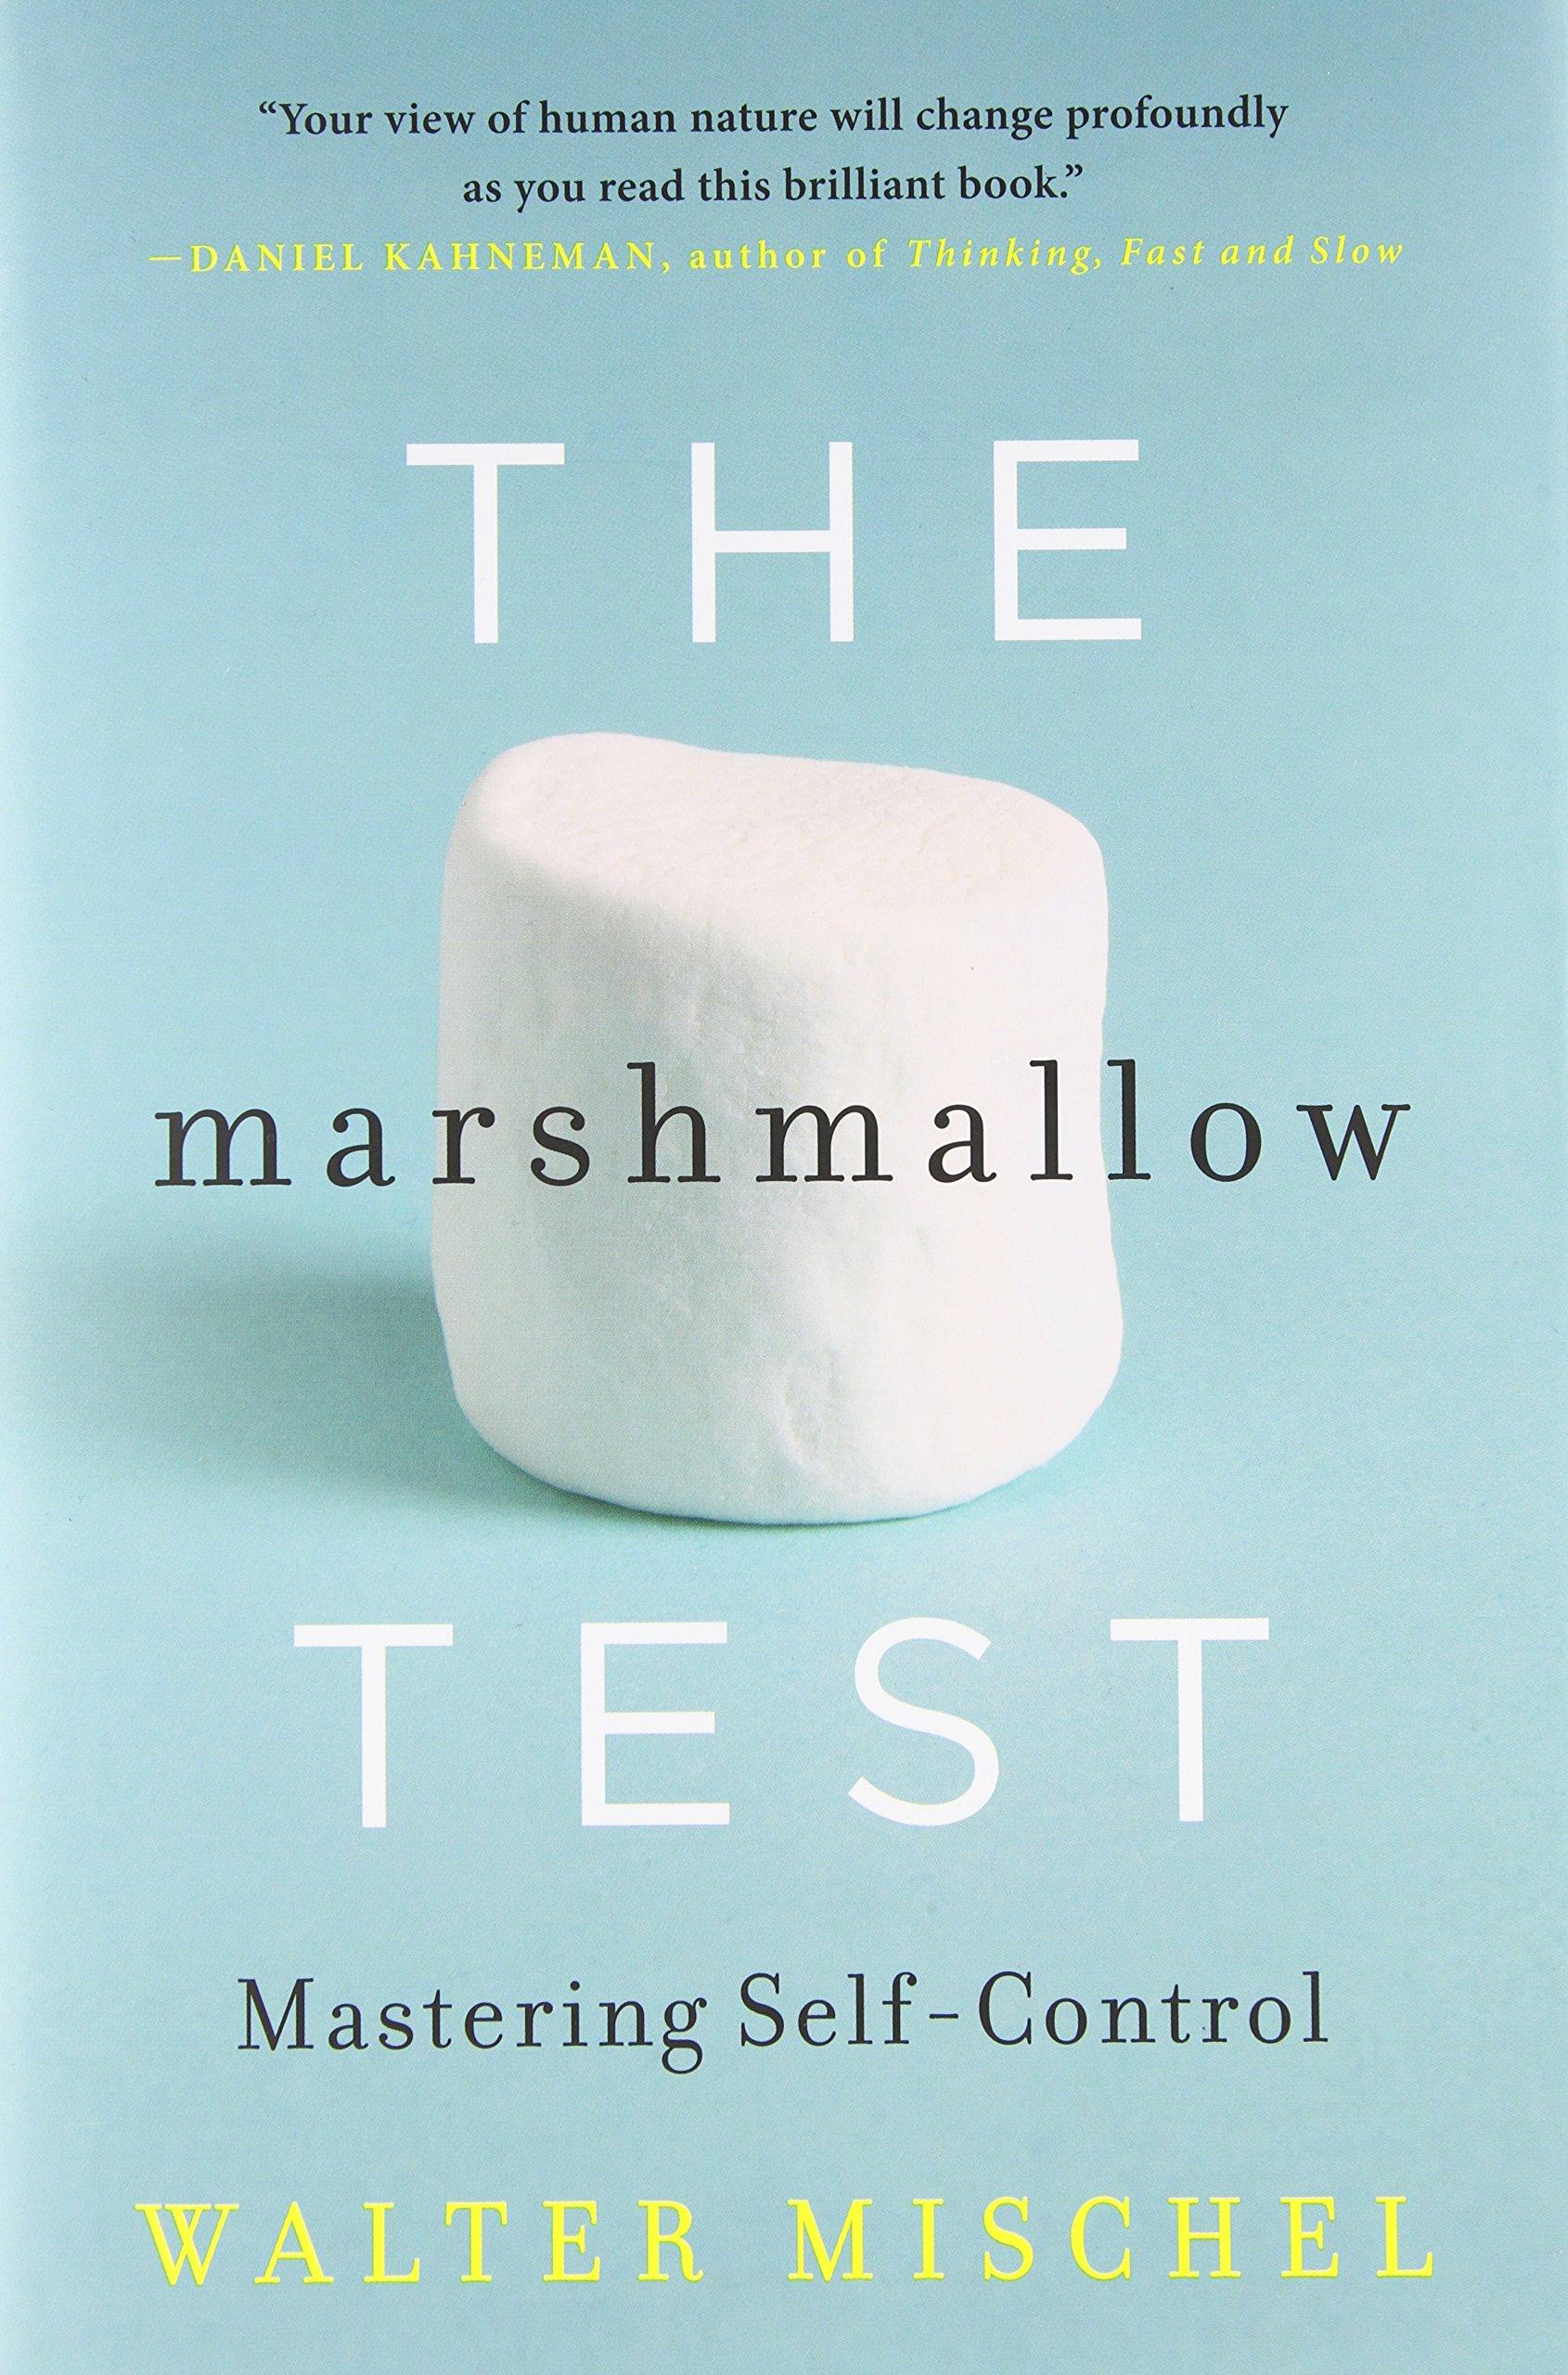 marshmallow test.jpg